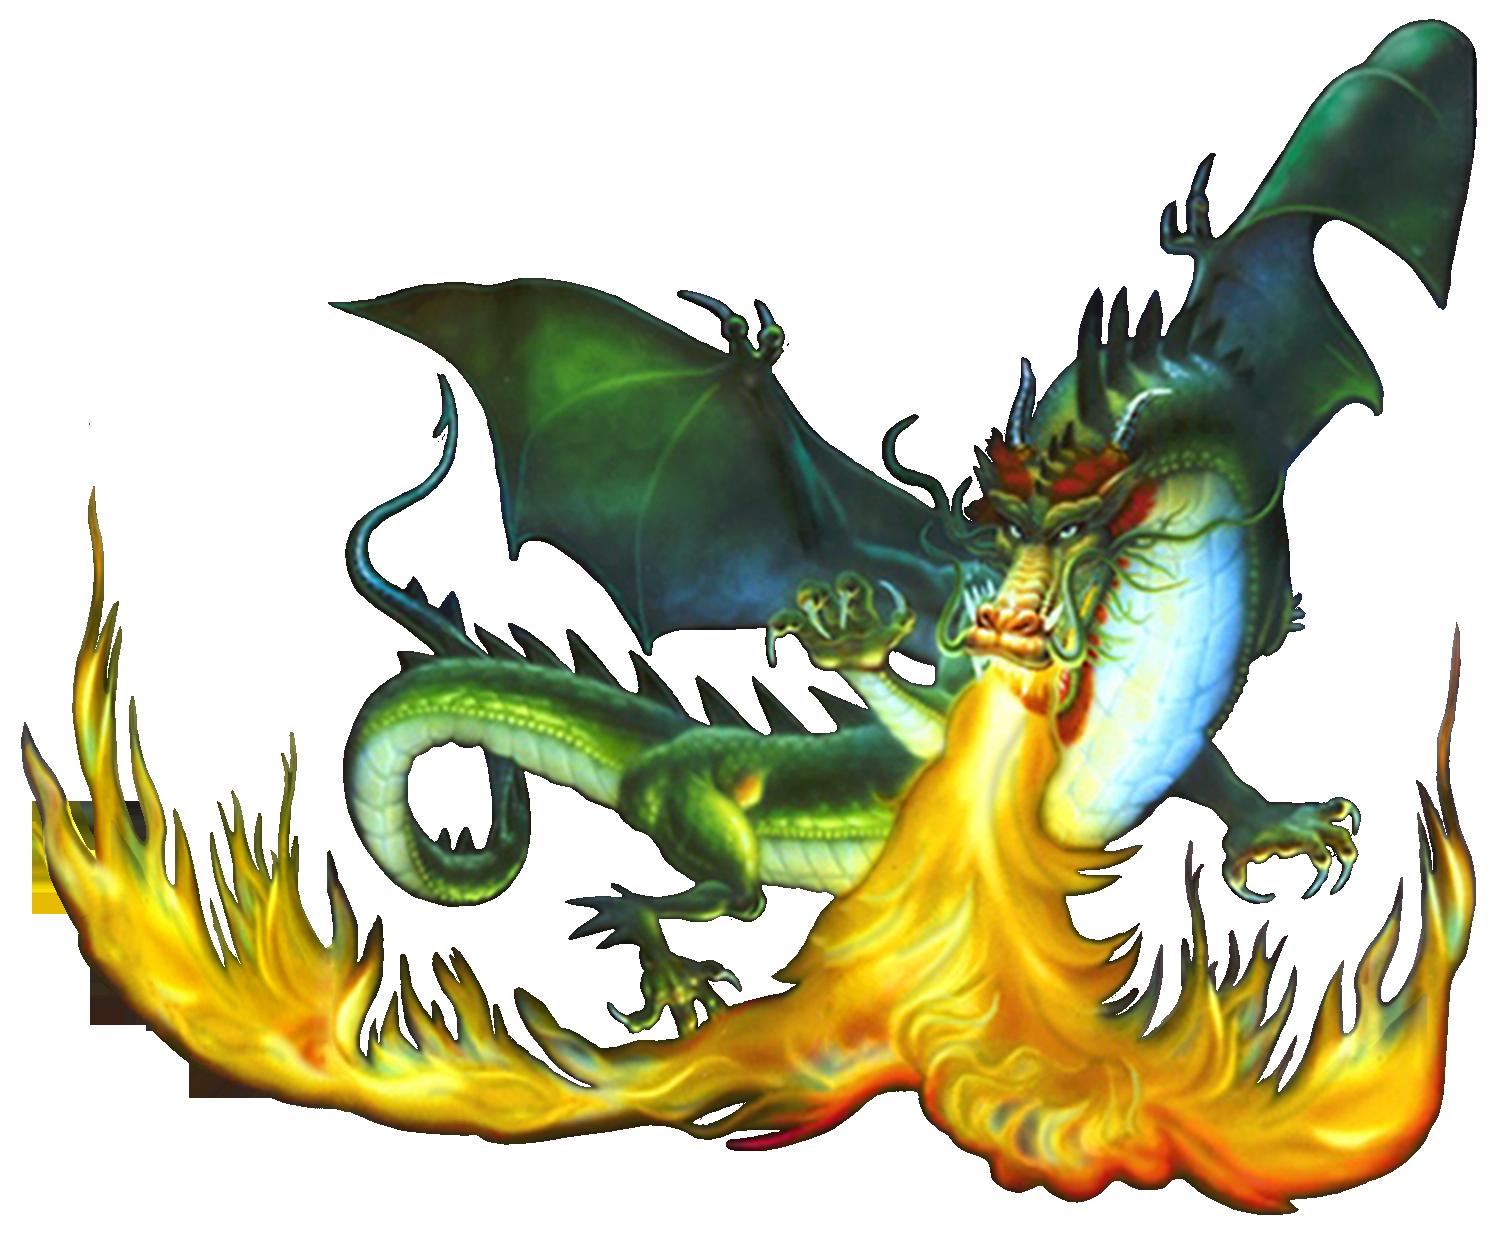 Fire Breathing Dragon Fire Breathing Dragon Dragon Drawing Dragon Art